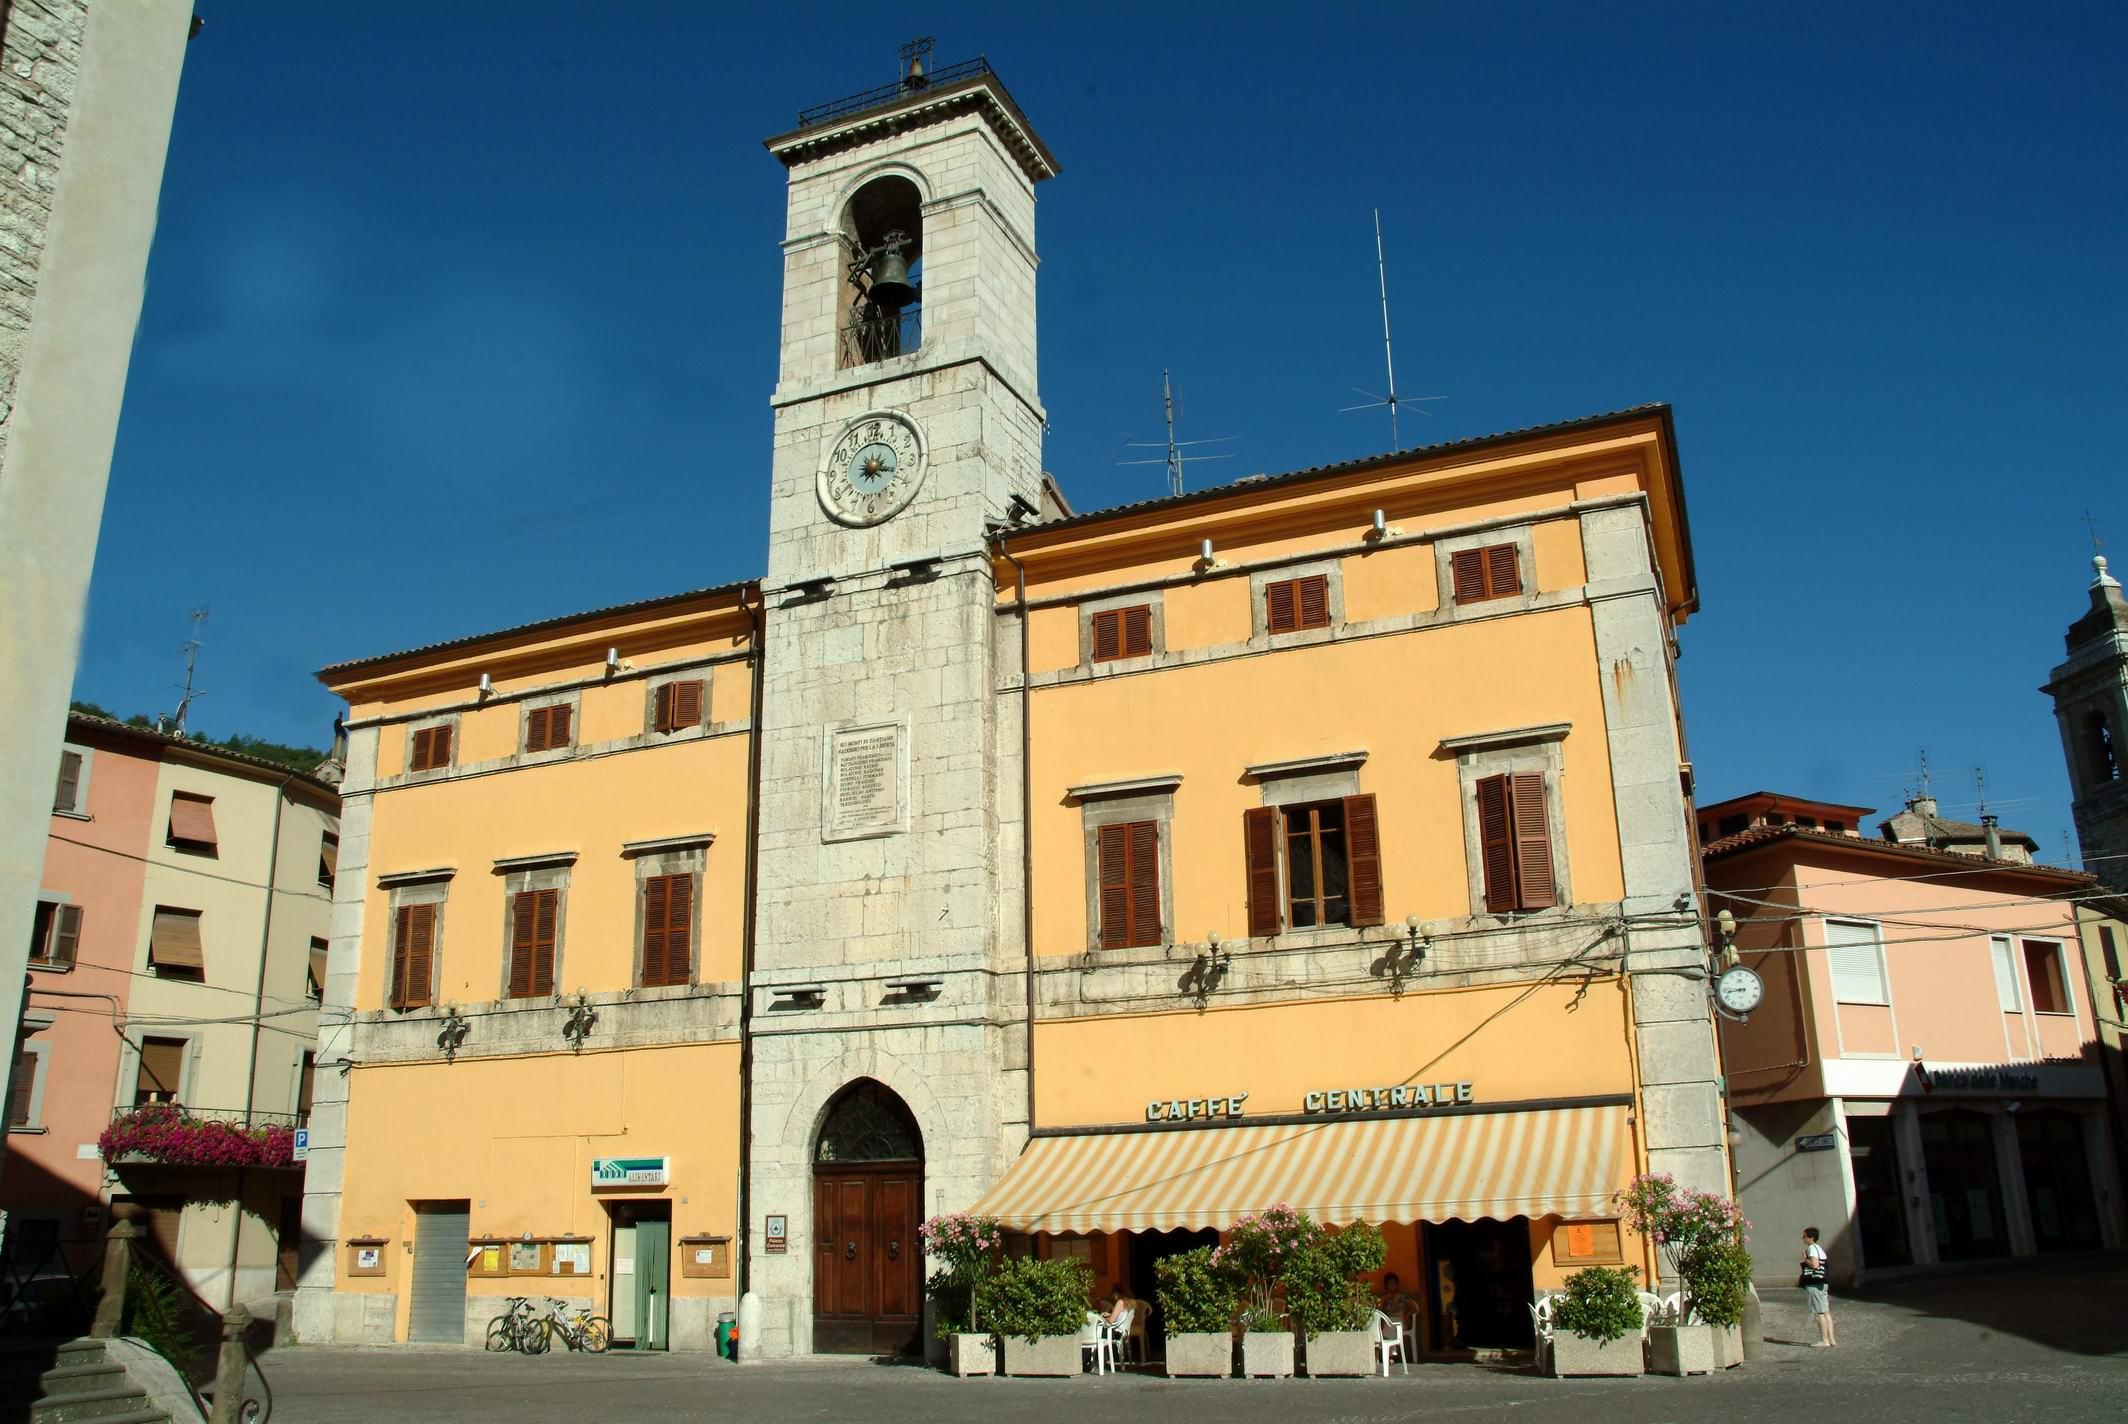 Palazzo Comunale van Cantiano